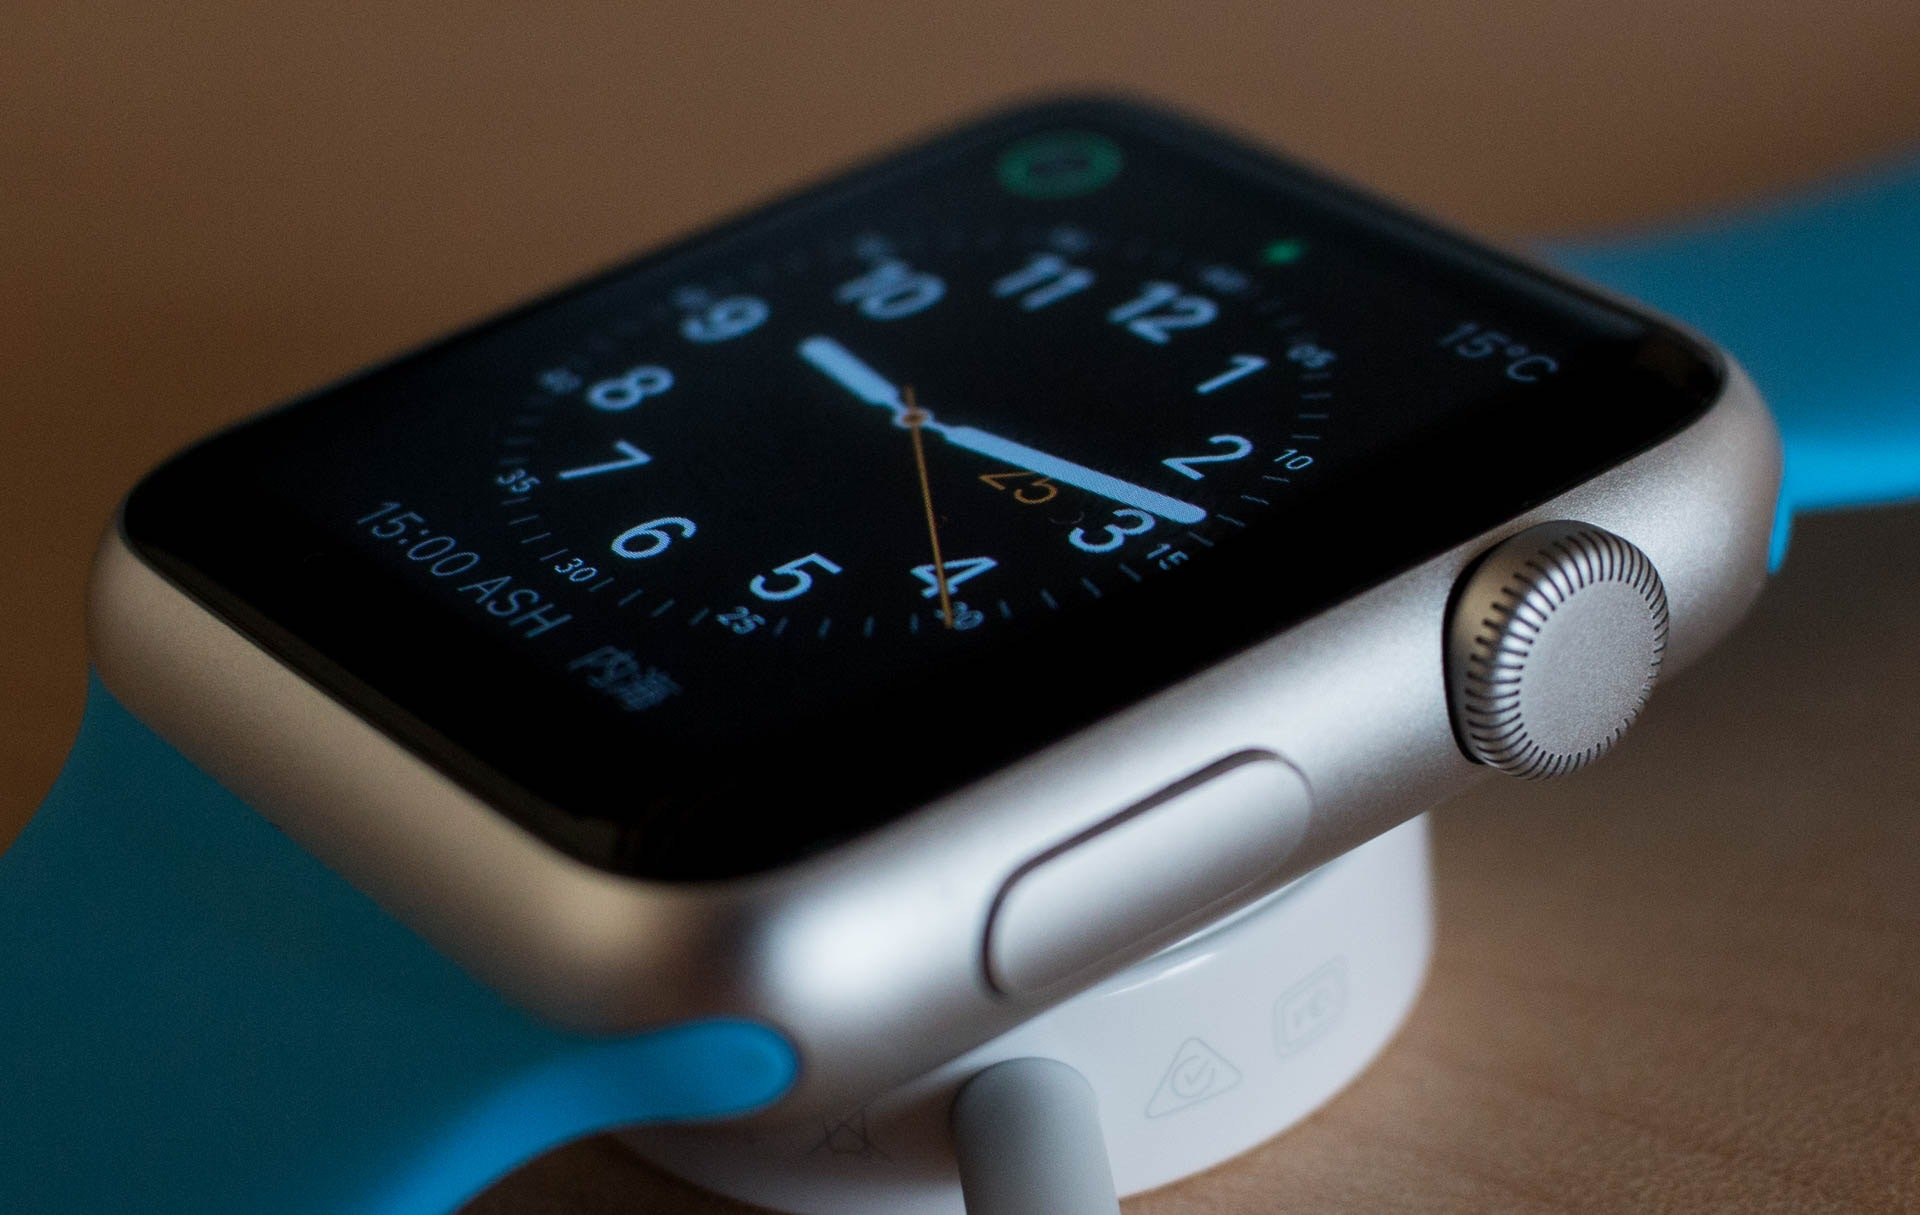 Apple Payの使い方|Apple Watchの設定・チャージ方法・使い勝手を徹底解説